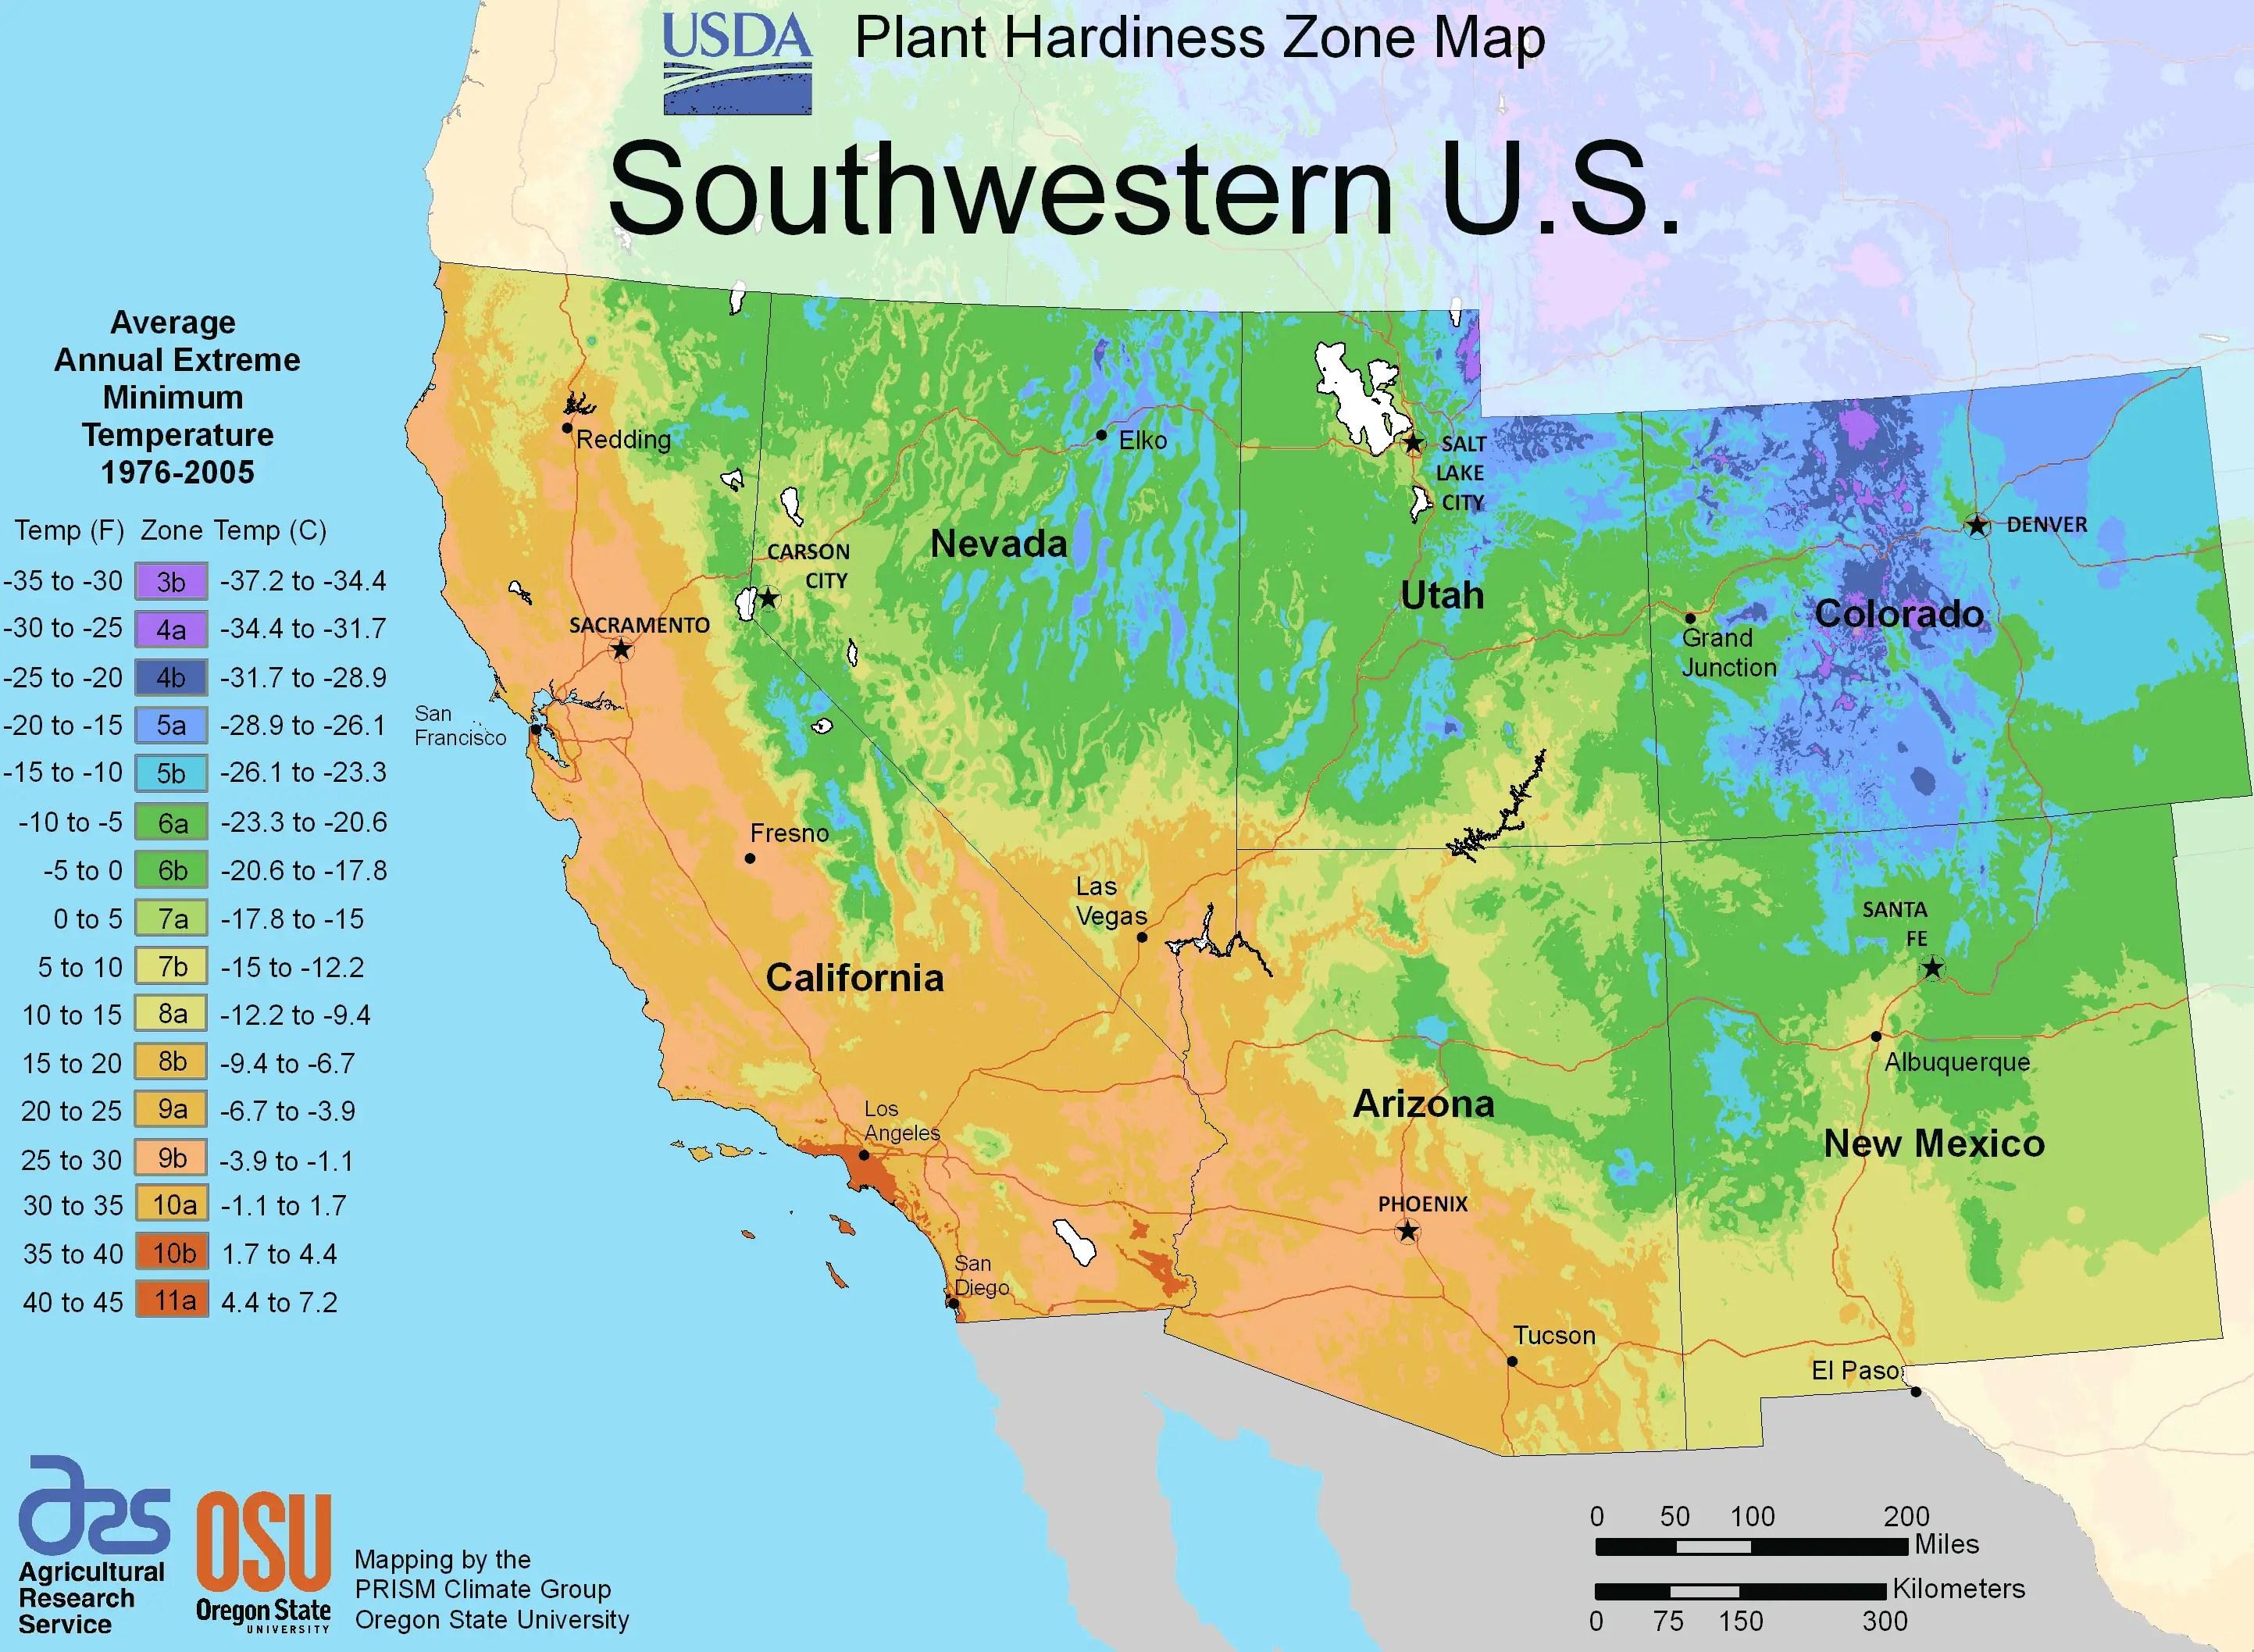 South West Us Plant Hardiness Zone Map Mapsof